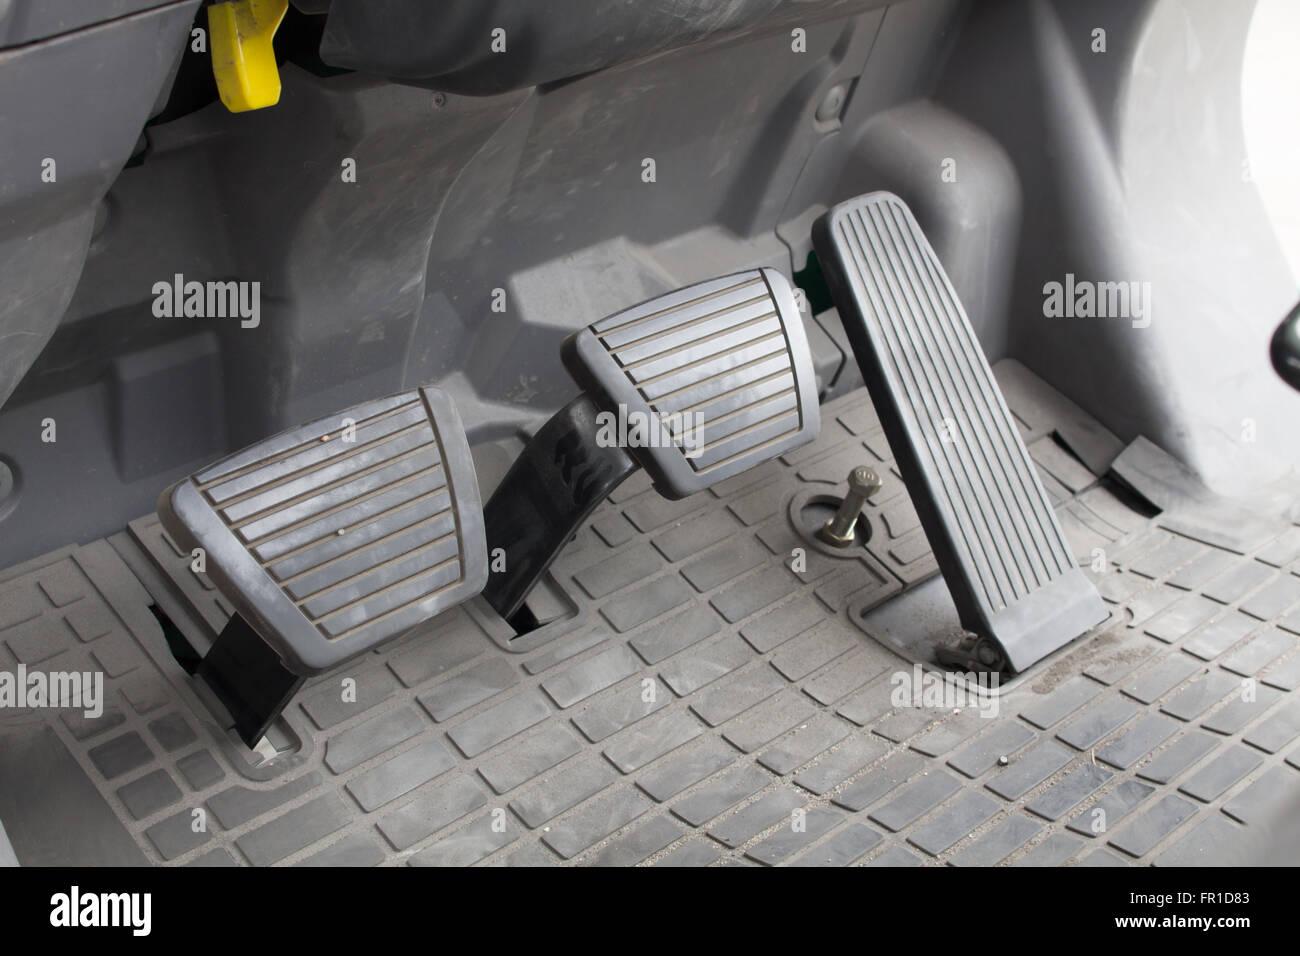 gas pedal stockfotos gas pedal bilder alamy. Black Bedroom Furniture Sets. Home Design Ideas